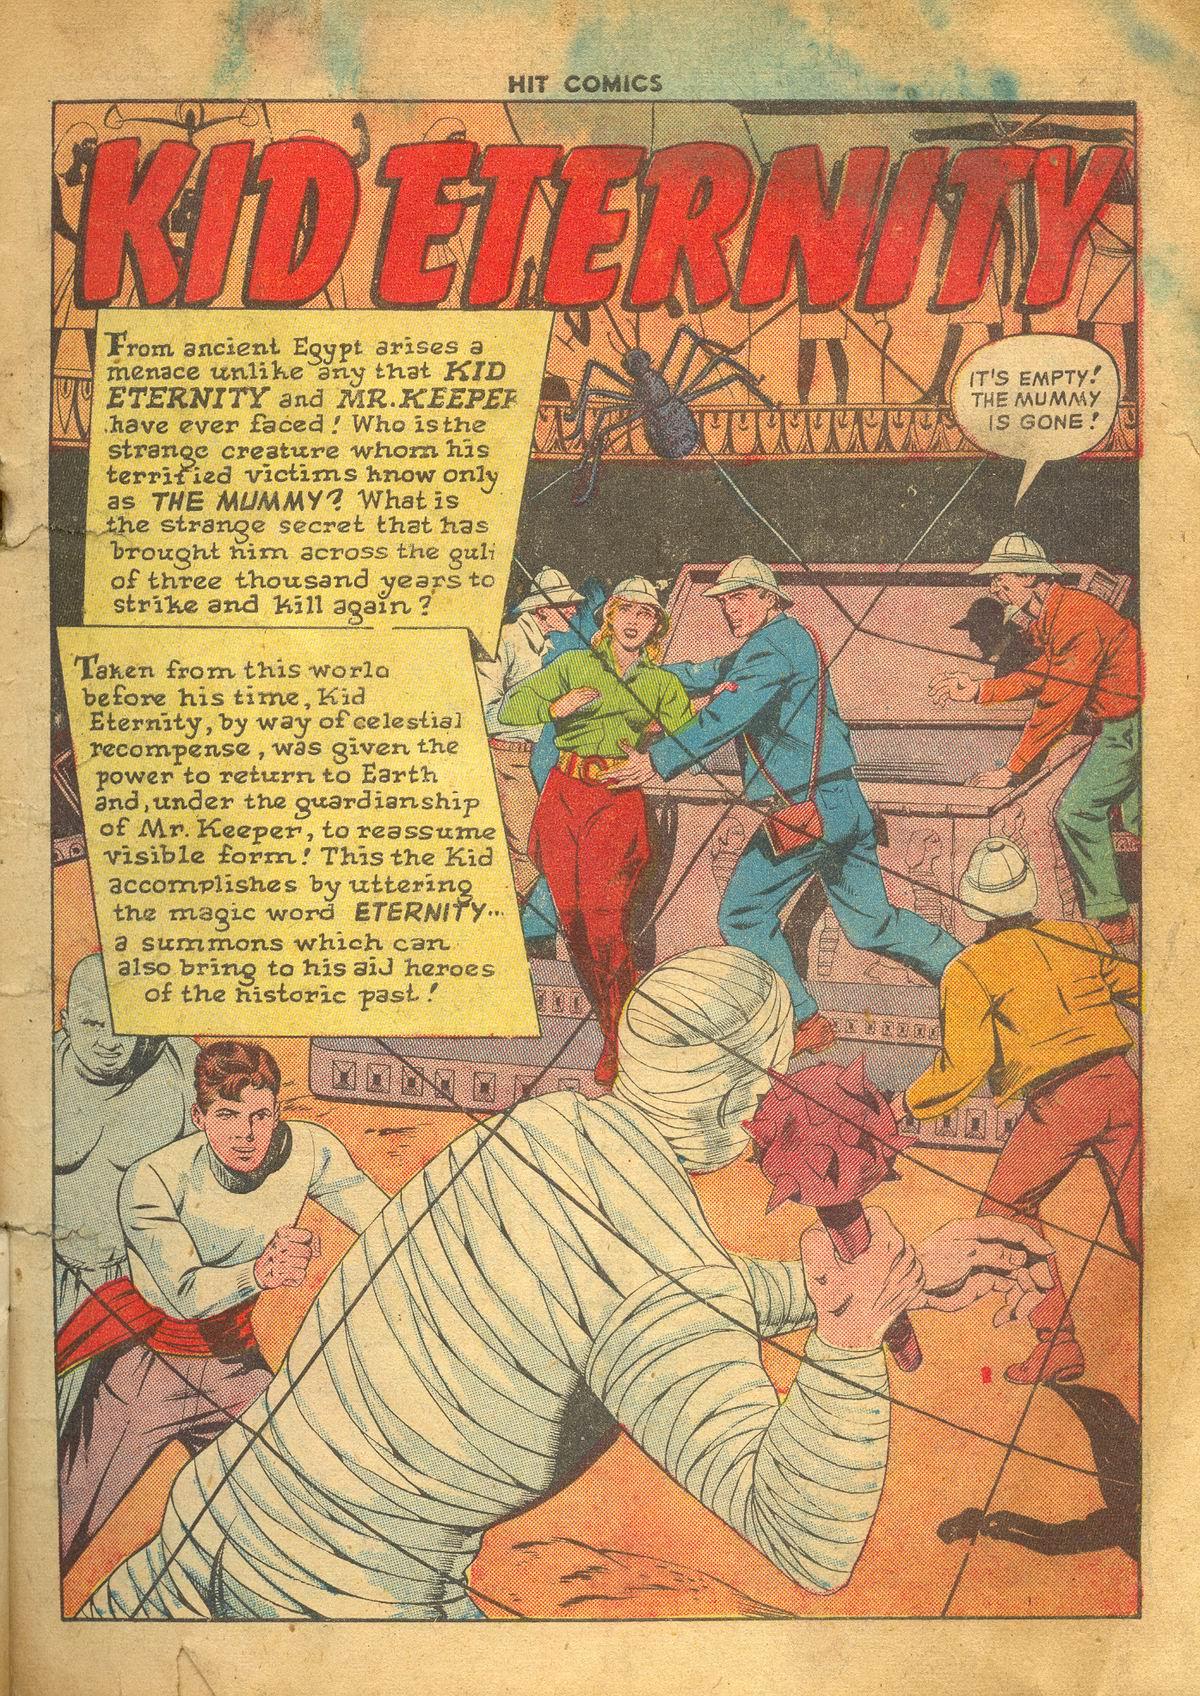 Read online Hit Comics comic -  Issue #60 - 3